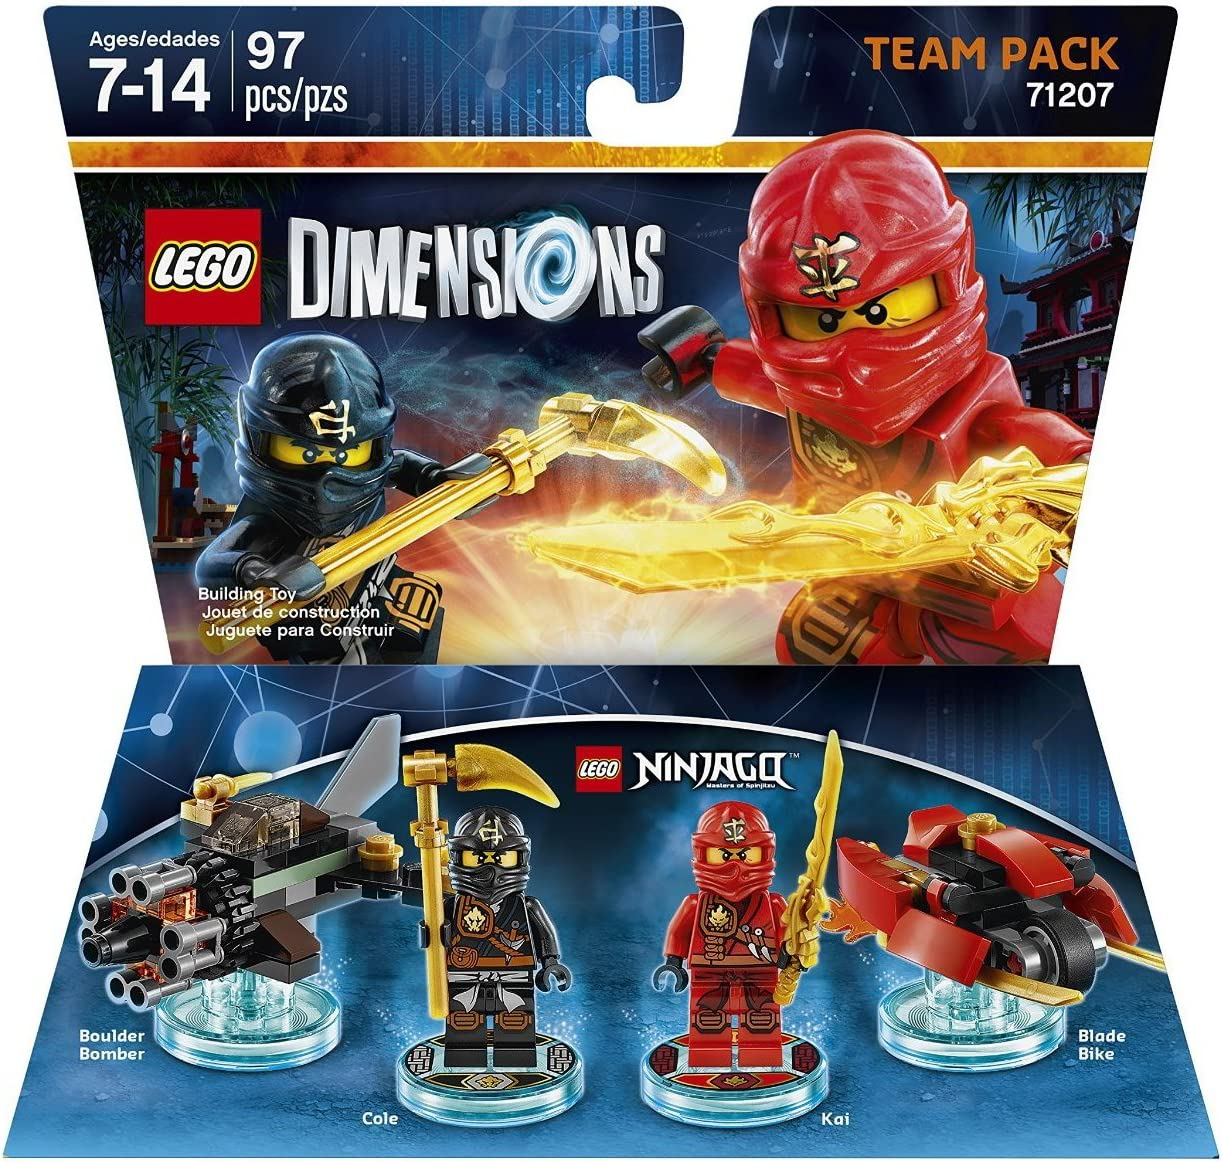 WB Games Ninjago Team Pack - Lego Dimensions